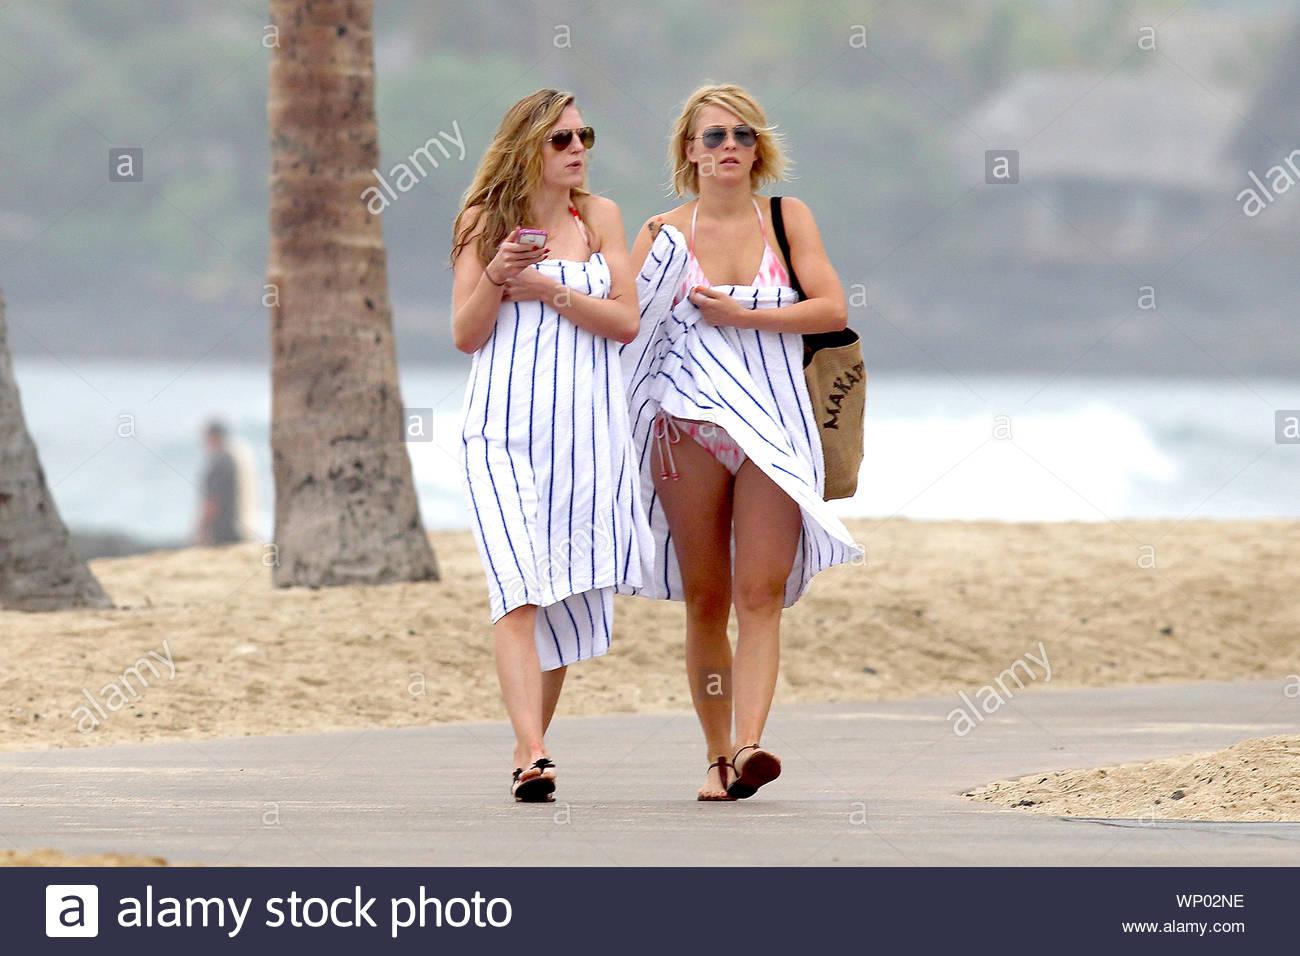 Shot On 12 5 12 Kona Hi Julianne Hough Hangs Out At The Beach In Hawaii